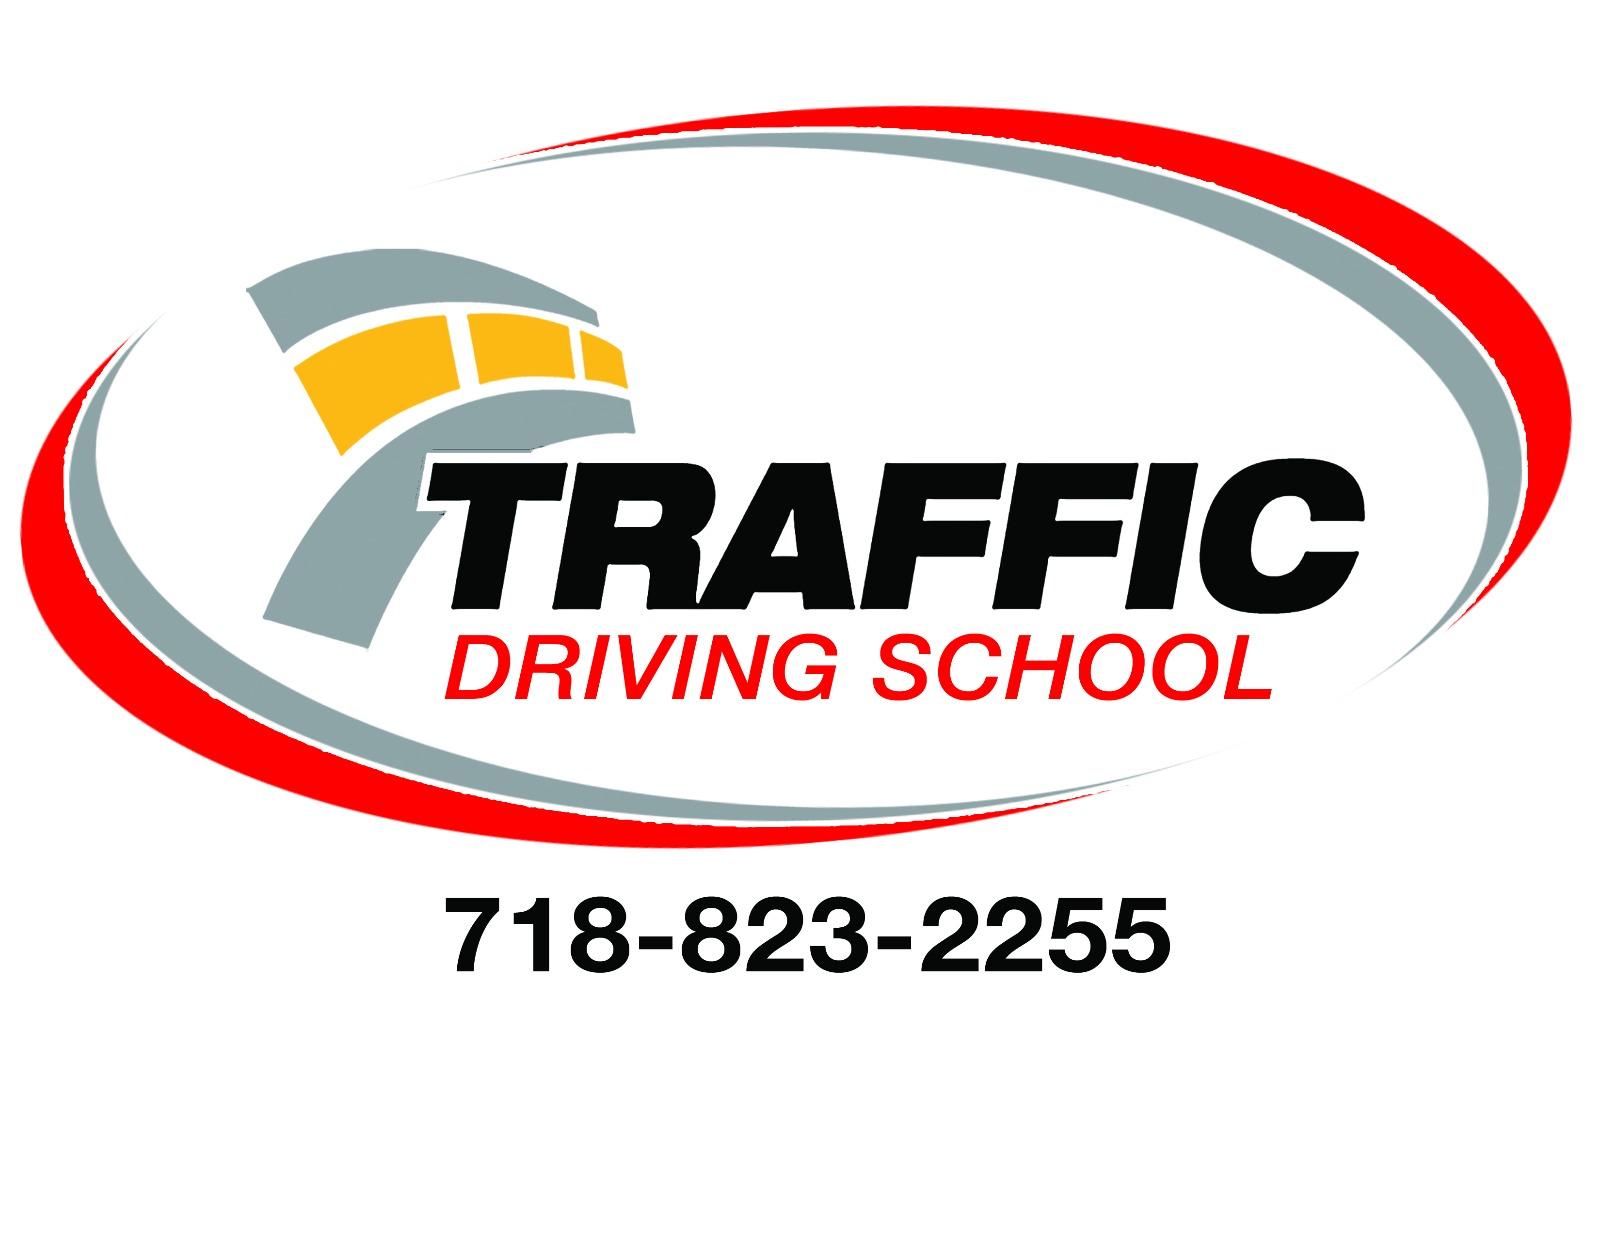 Traffic Driving School